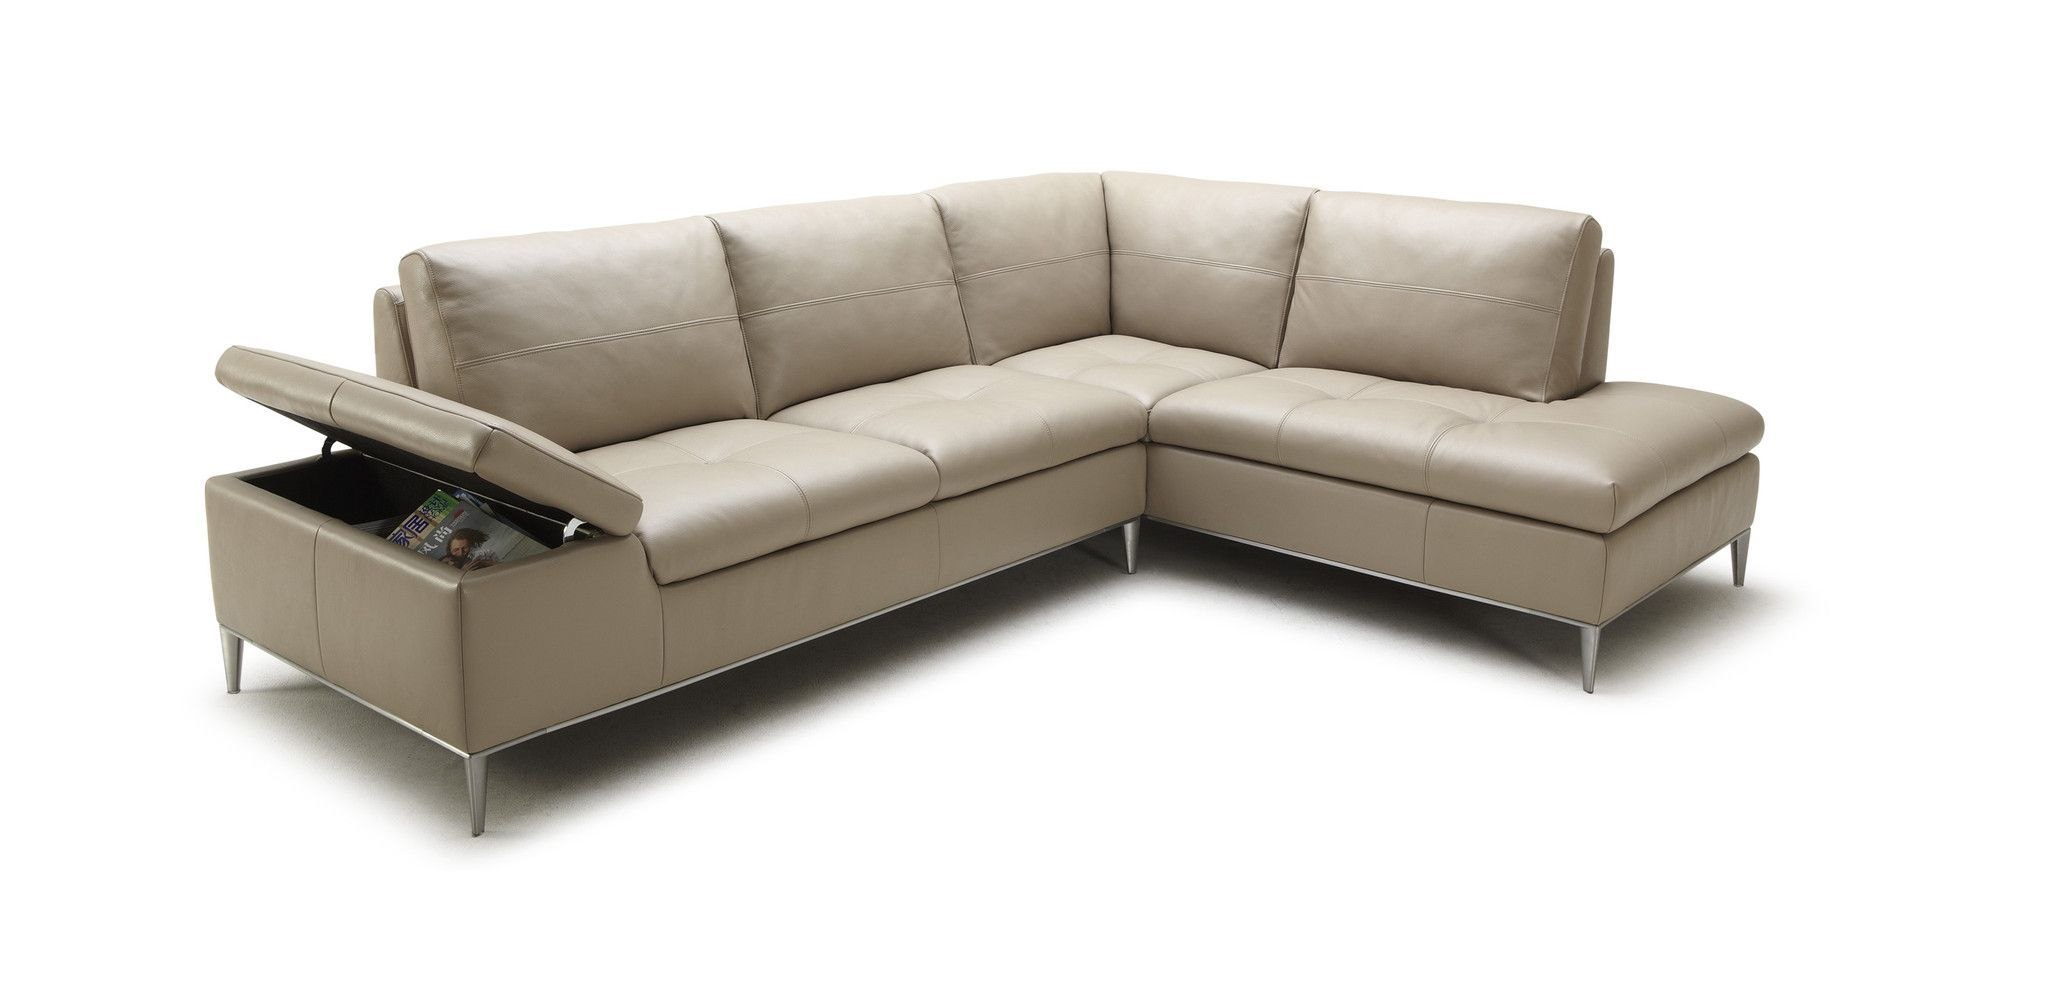 Divani Casa Gardenia Modern Sectional sofa with Chaise This